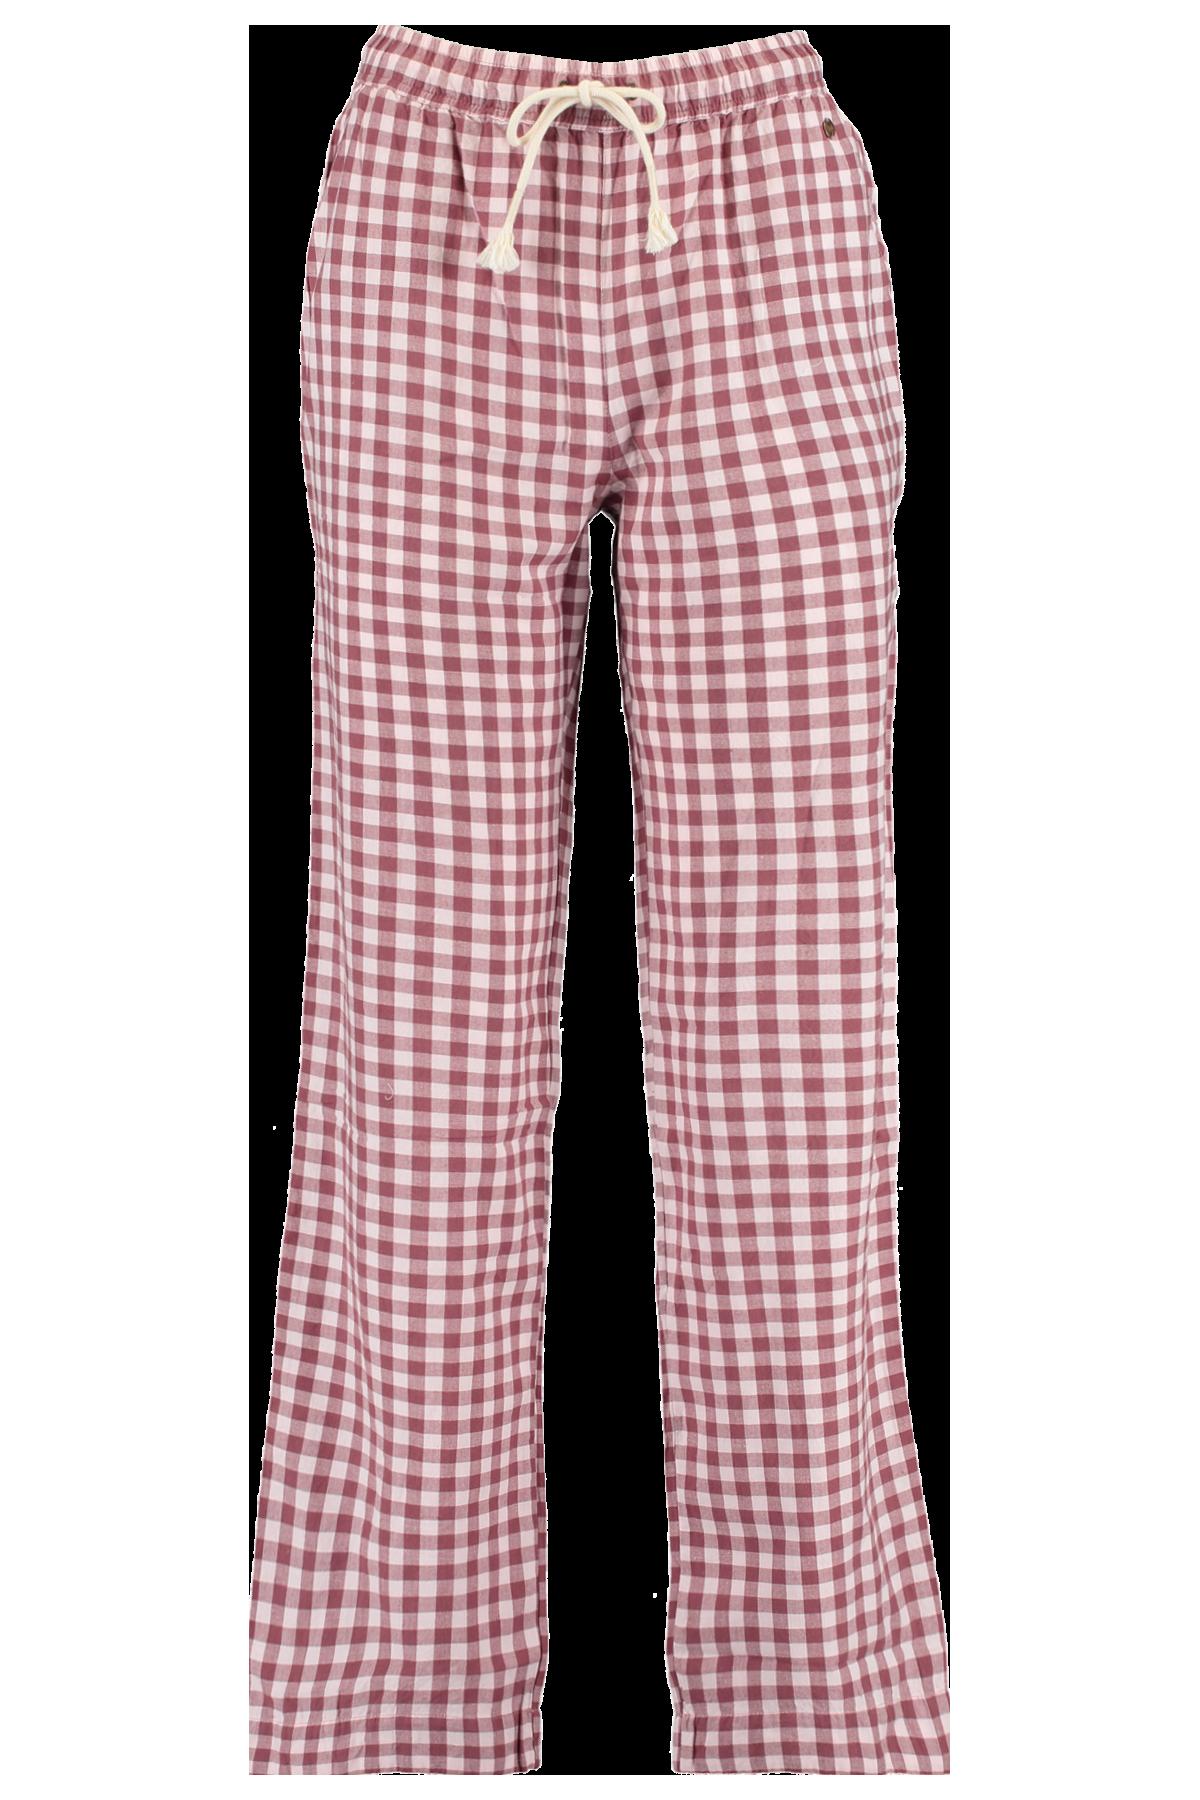 Loungepants LOYCE